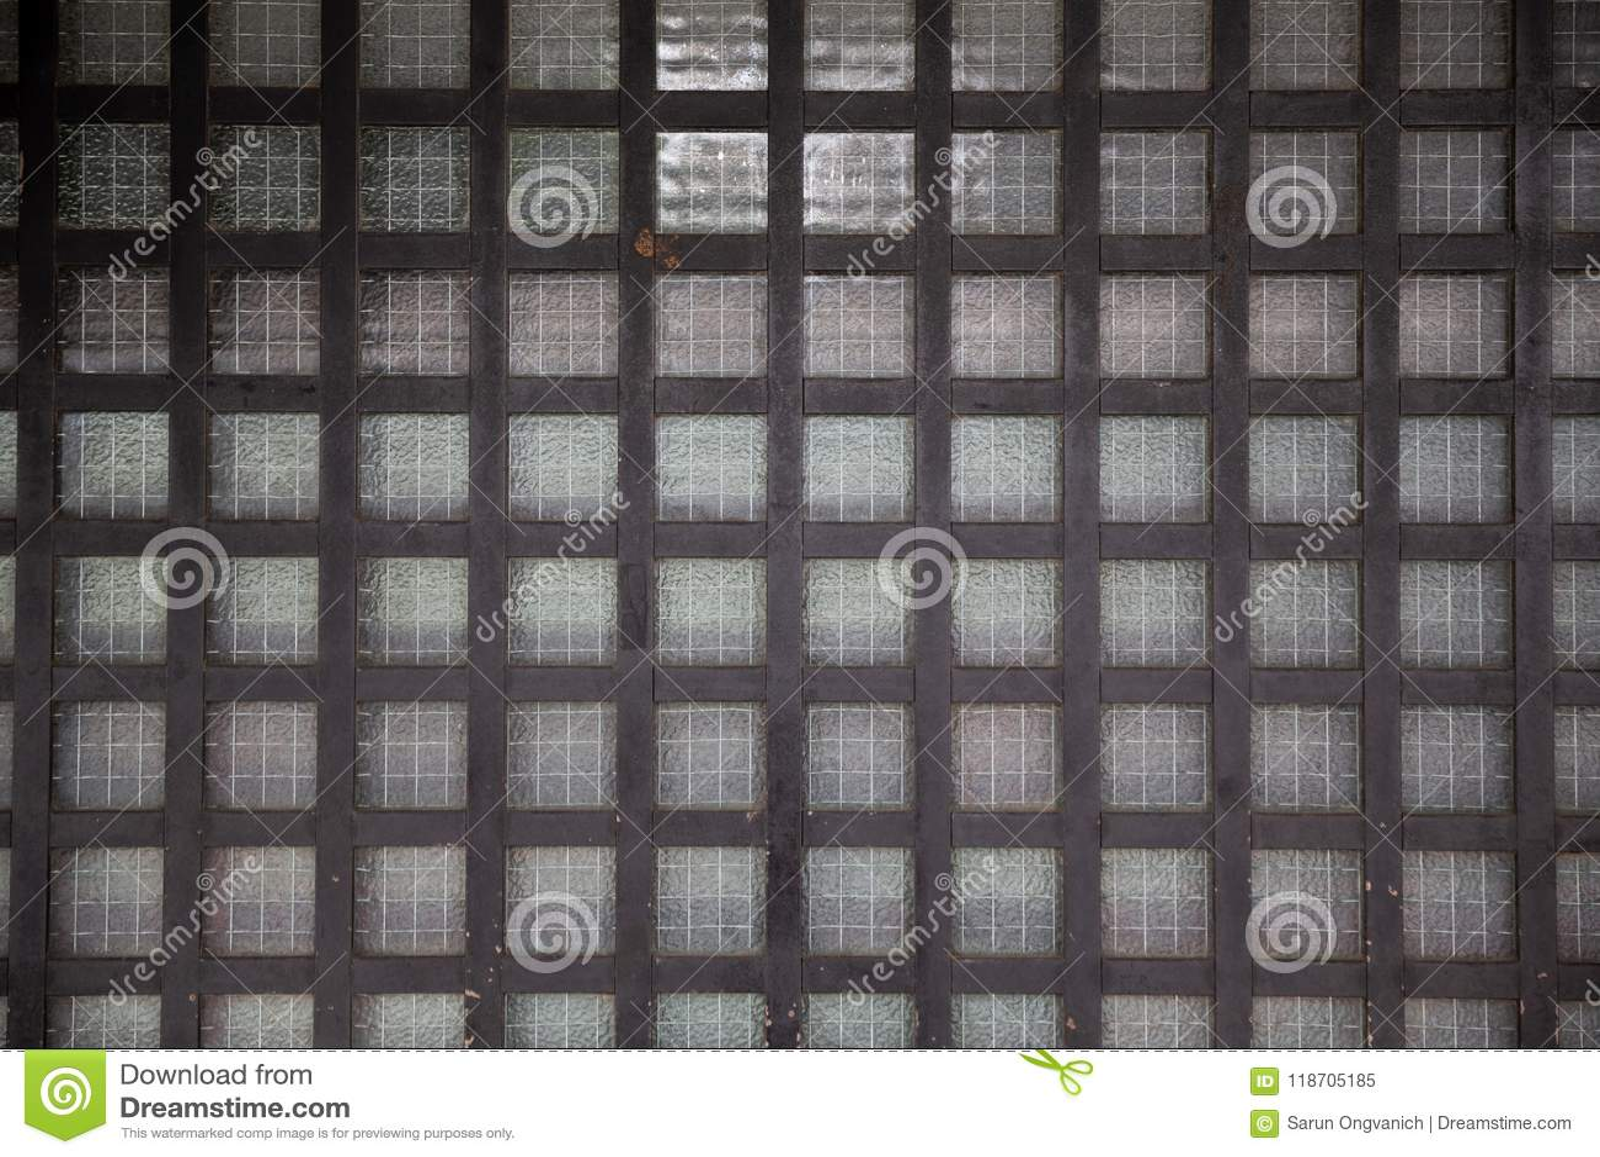 Japanese old wooden grid window or door. & Close Up Of Japanese Old Wooden Grid Window Or Door. Stock Image ...